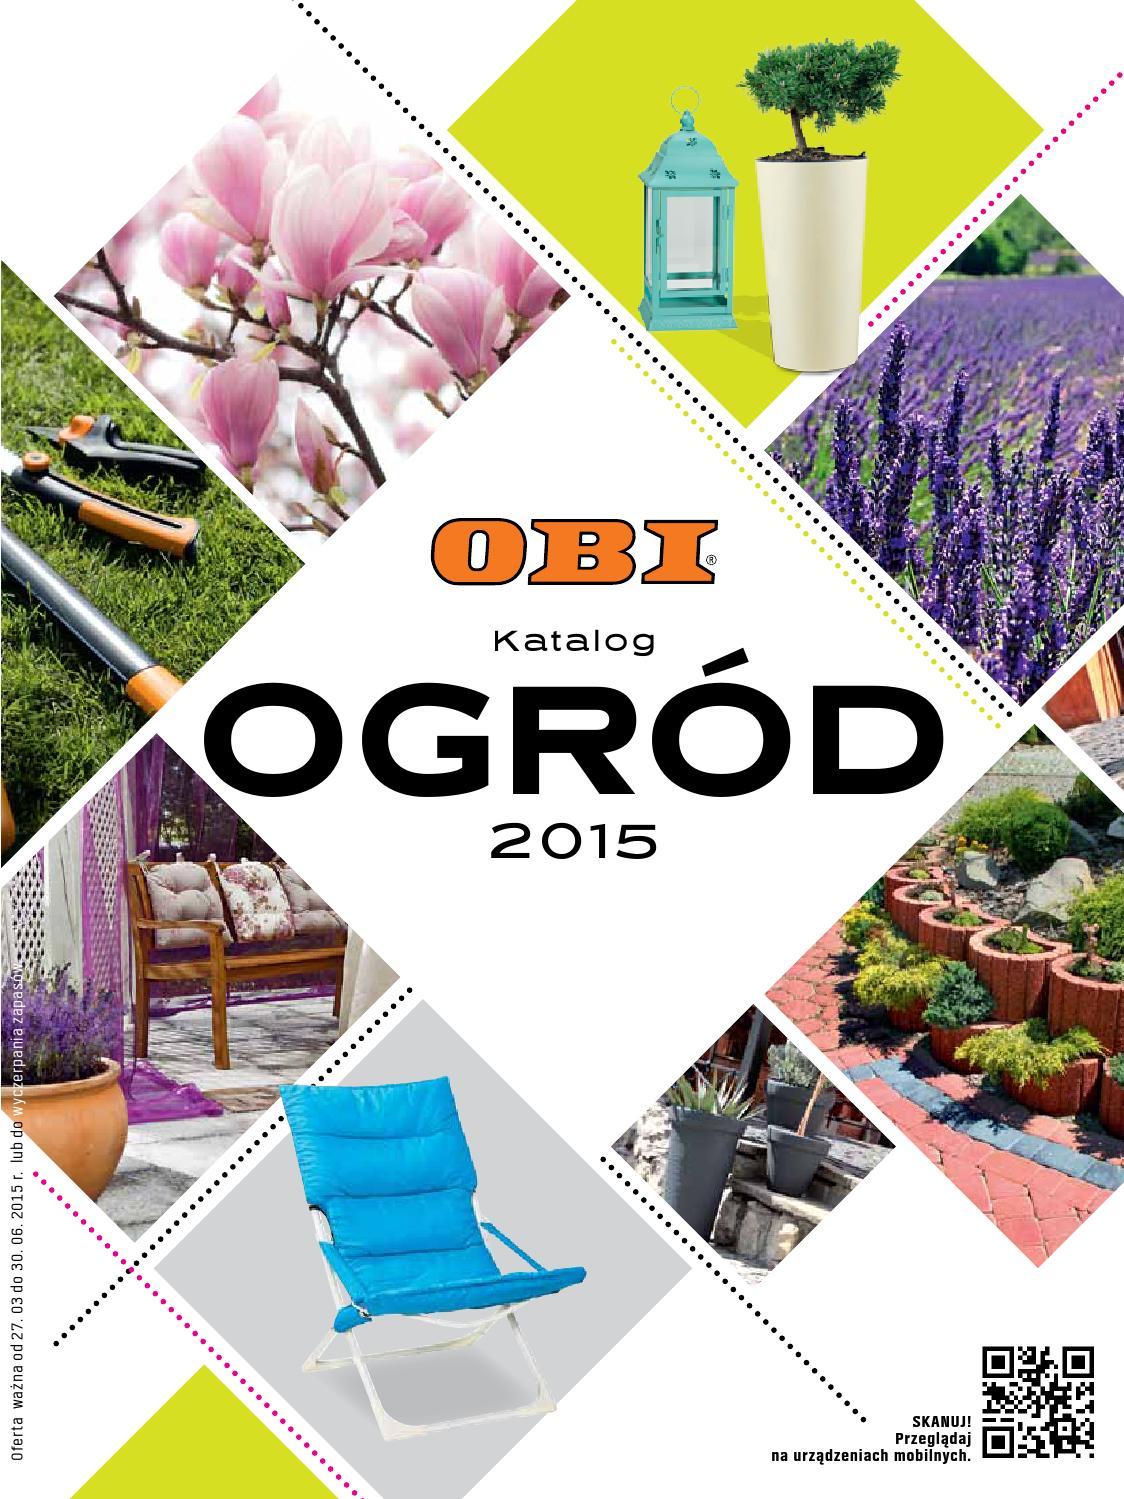 Obi Katalog Ogród 2015 By Finmarket Issuu